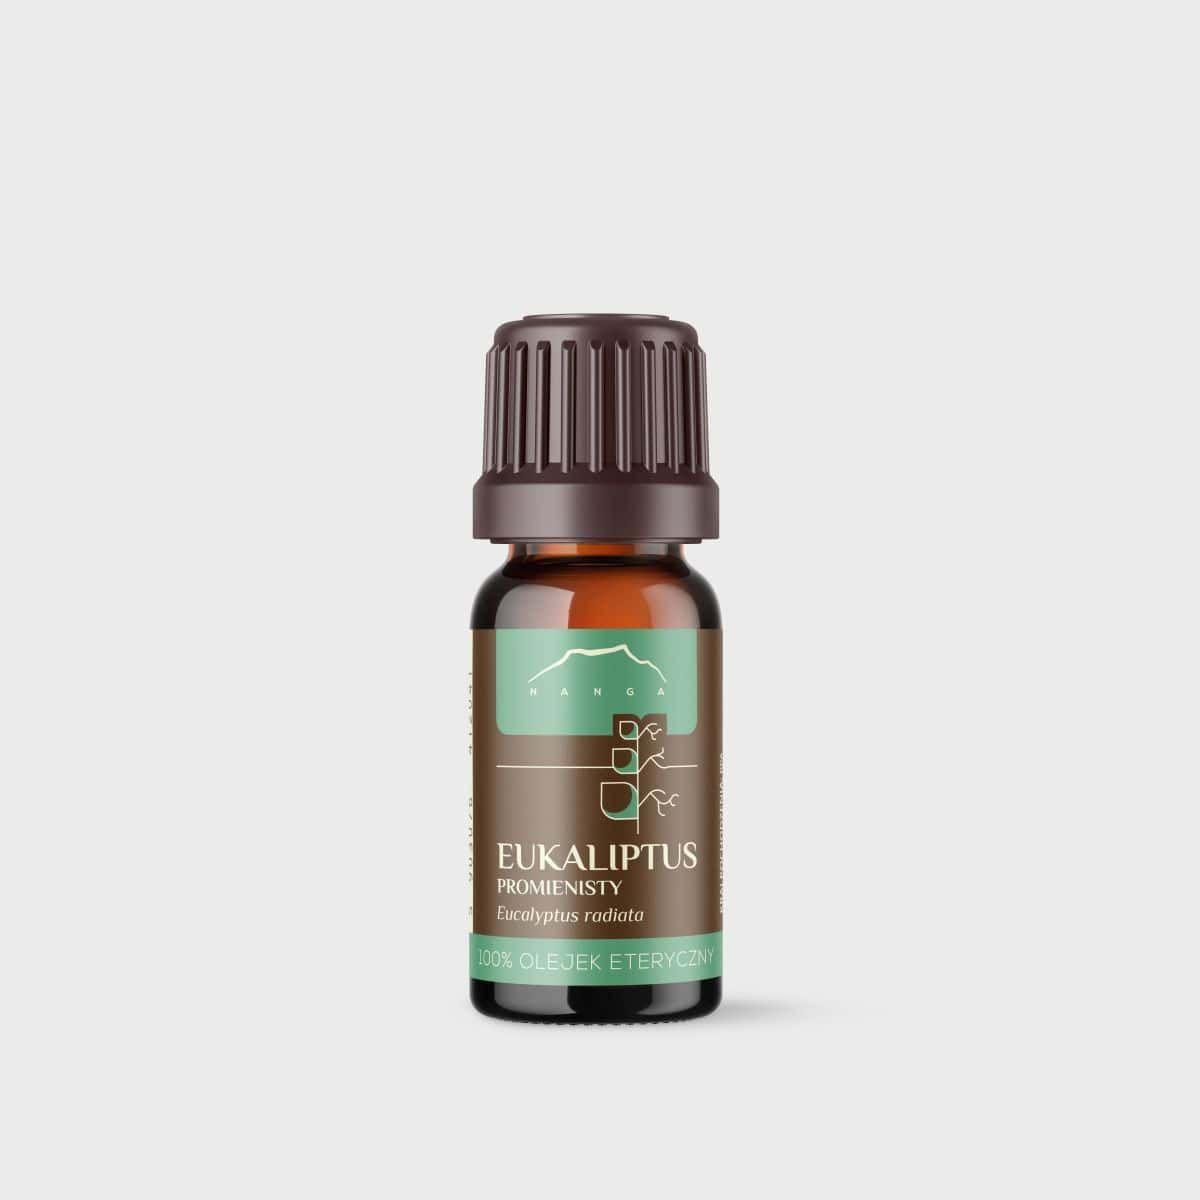 Olejek z eukaliptusa promienistego 100% eteryczny Nanga